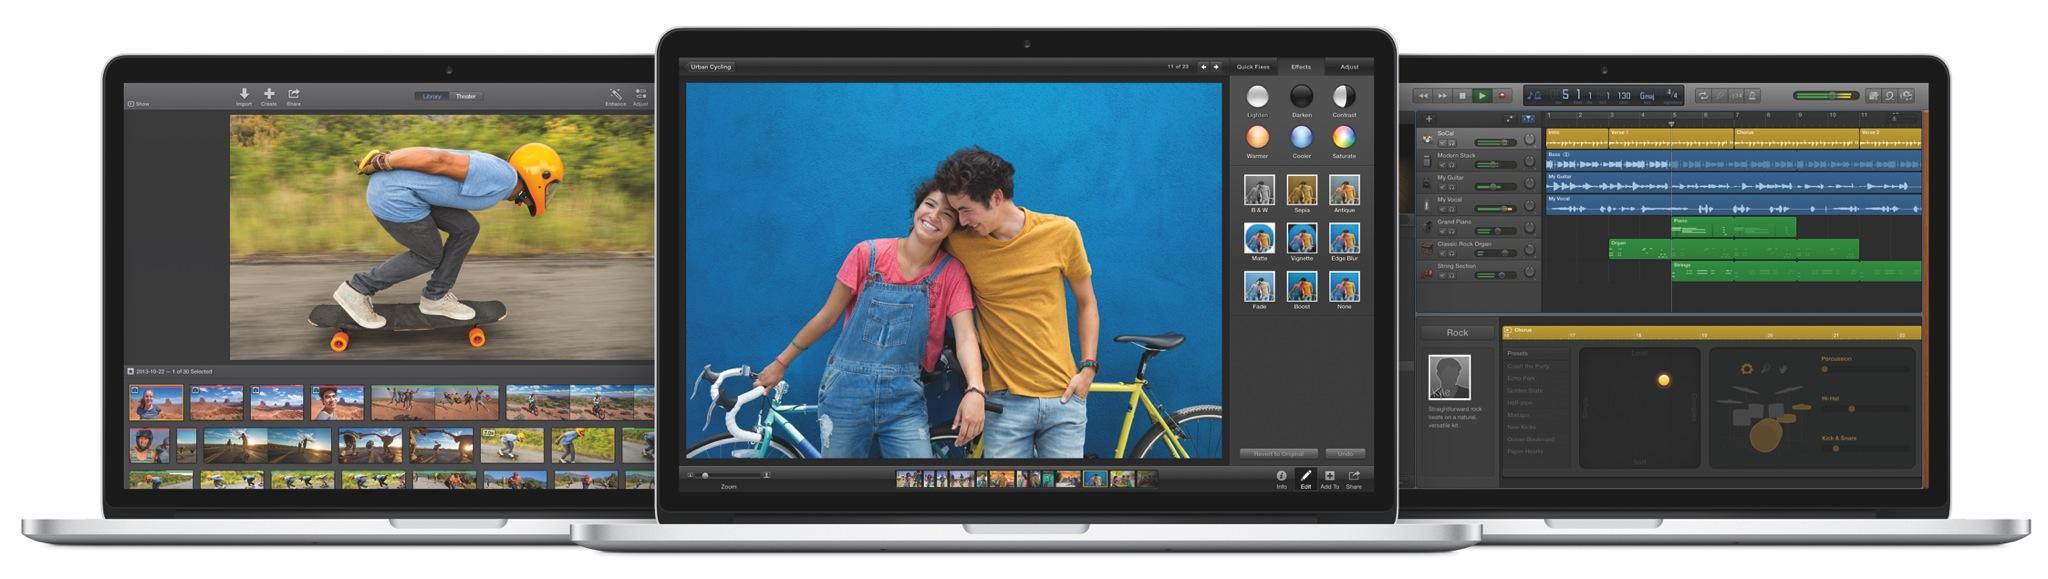 2013 iLife for Mac (three up, MacBook)